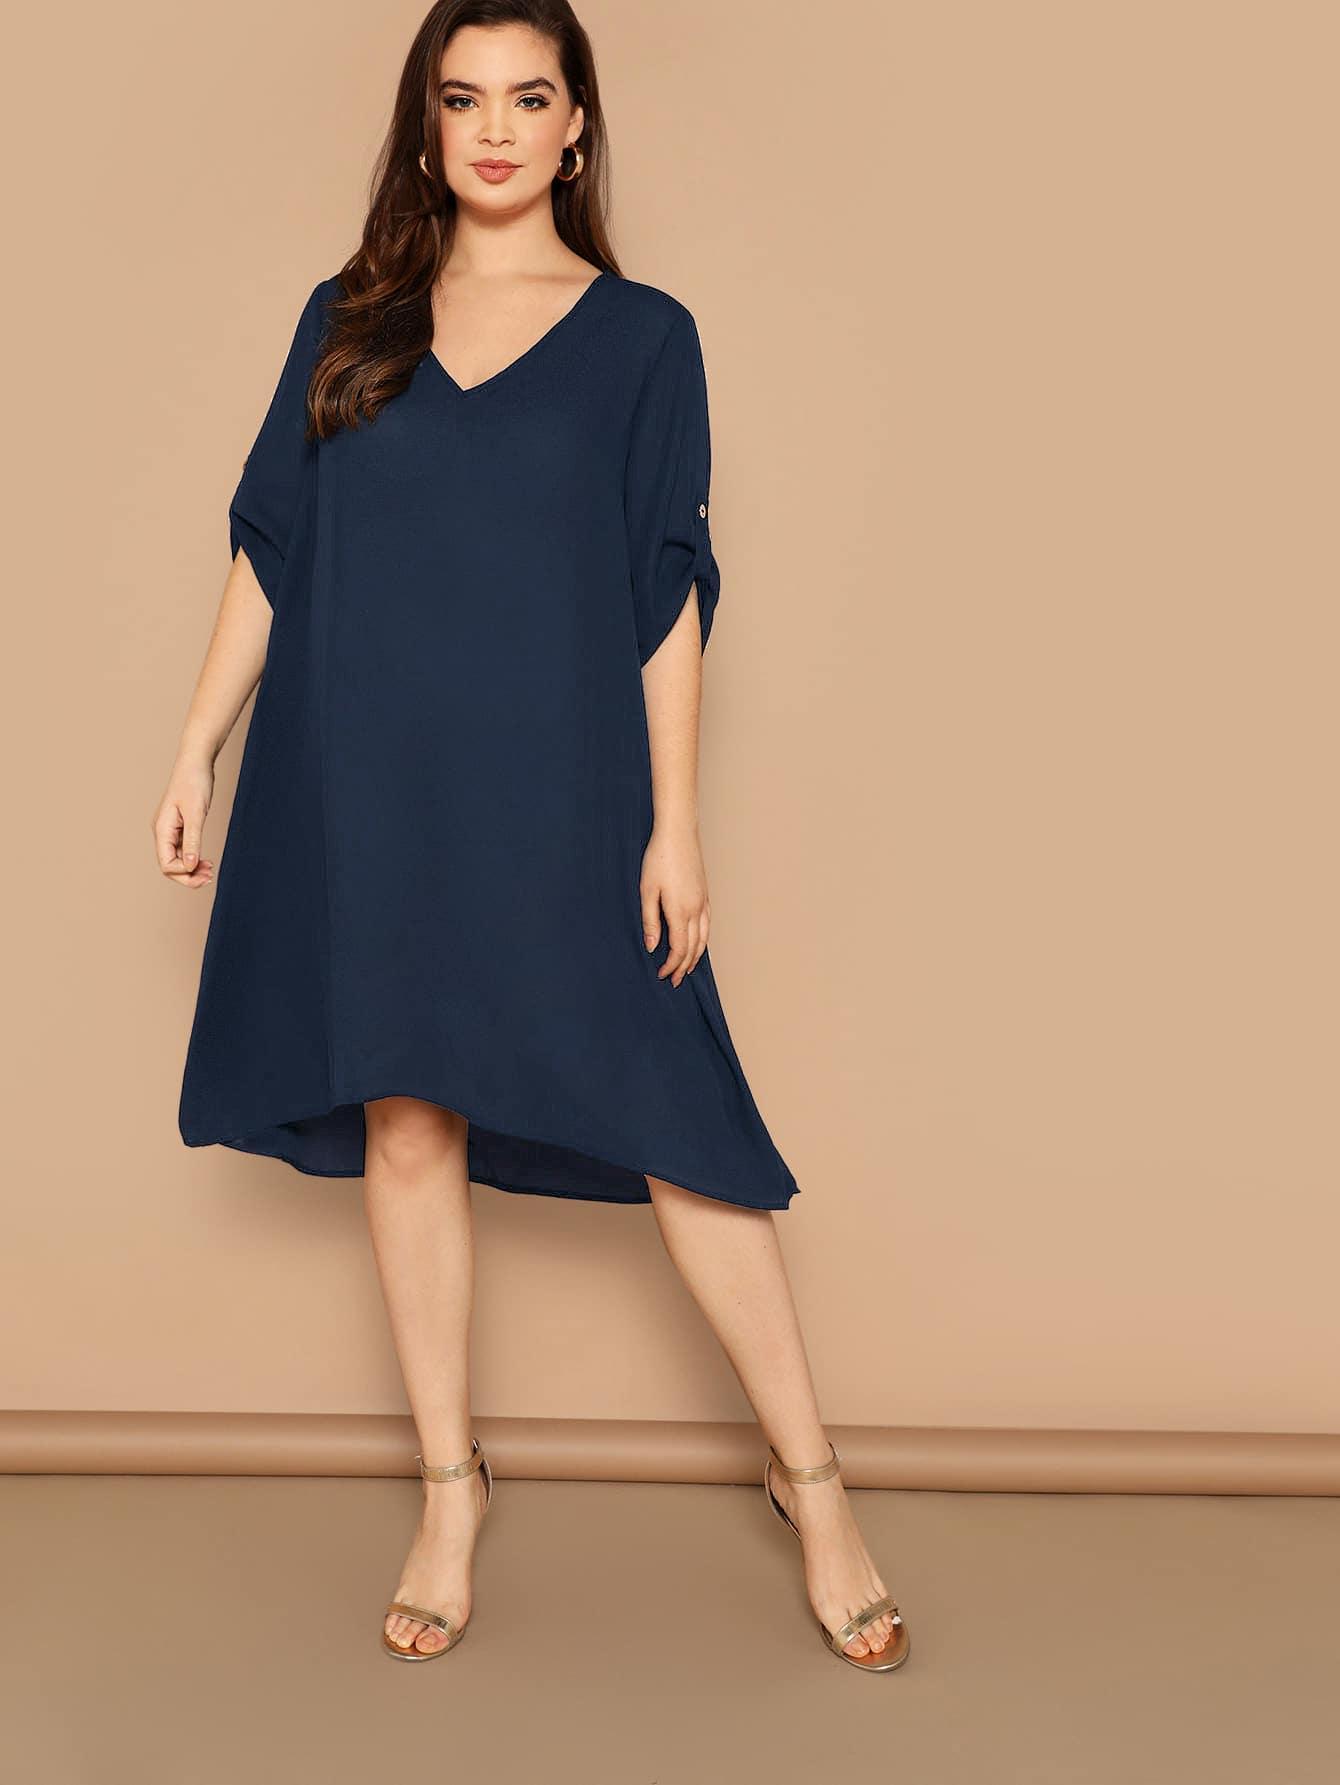 ebb46d5219 Plus Roll-up Sleeve Dip Hem Tunic Dress, Faith Bowman - shein.com -  imall.com